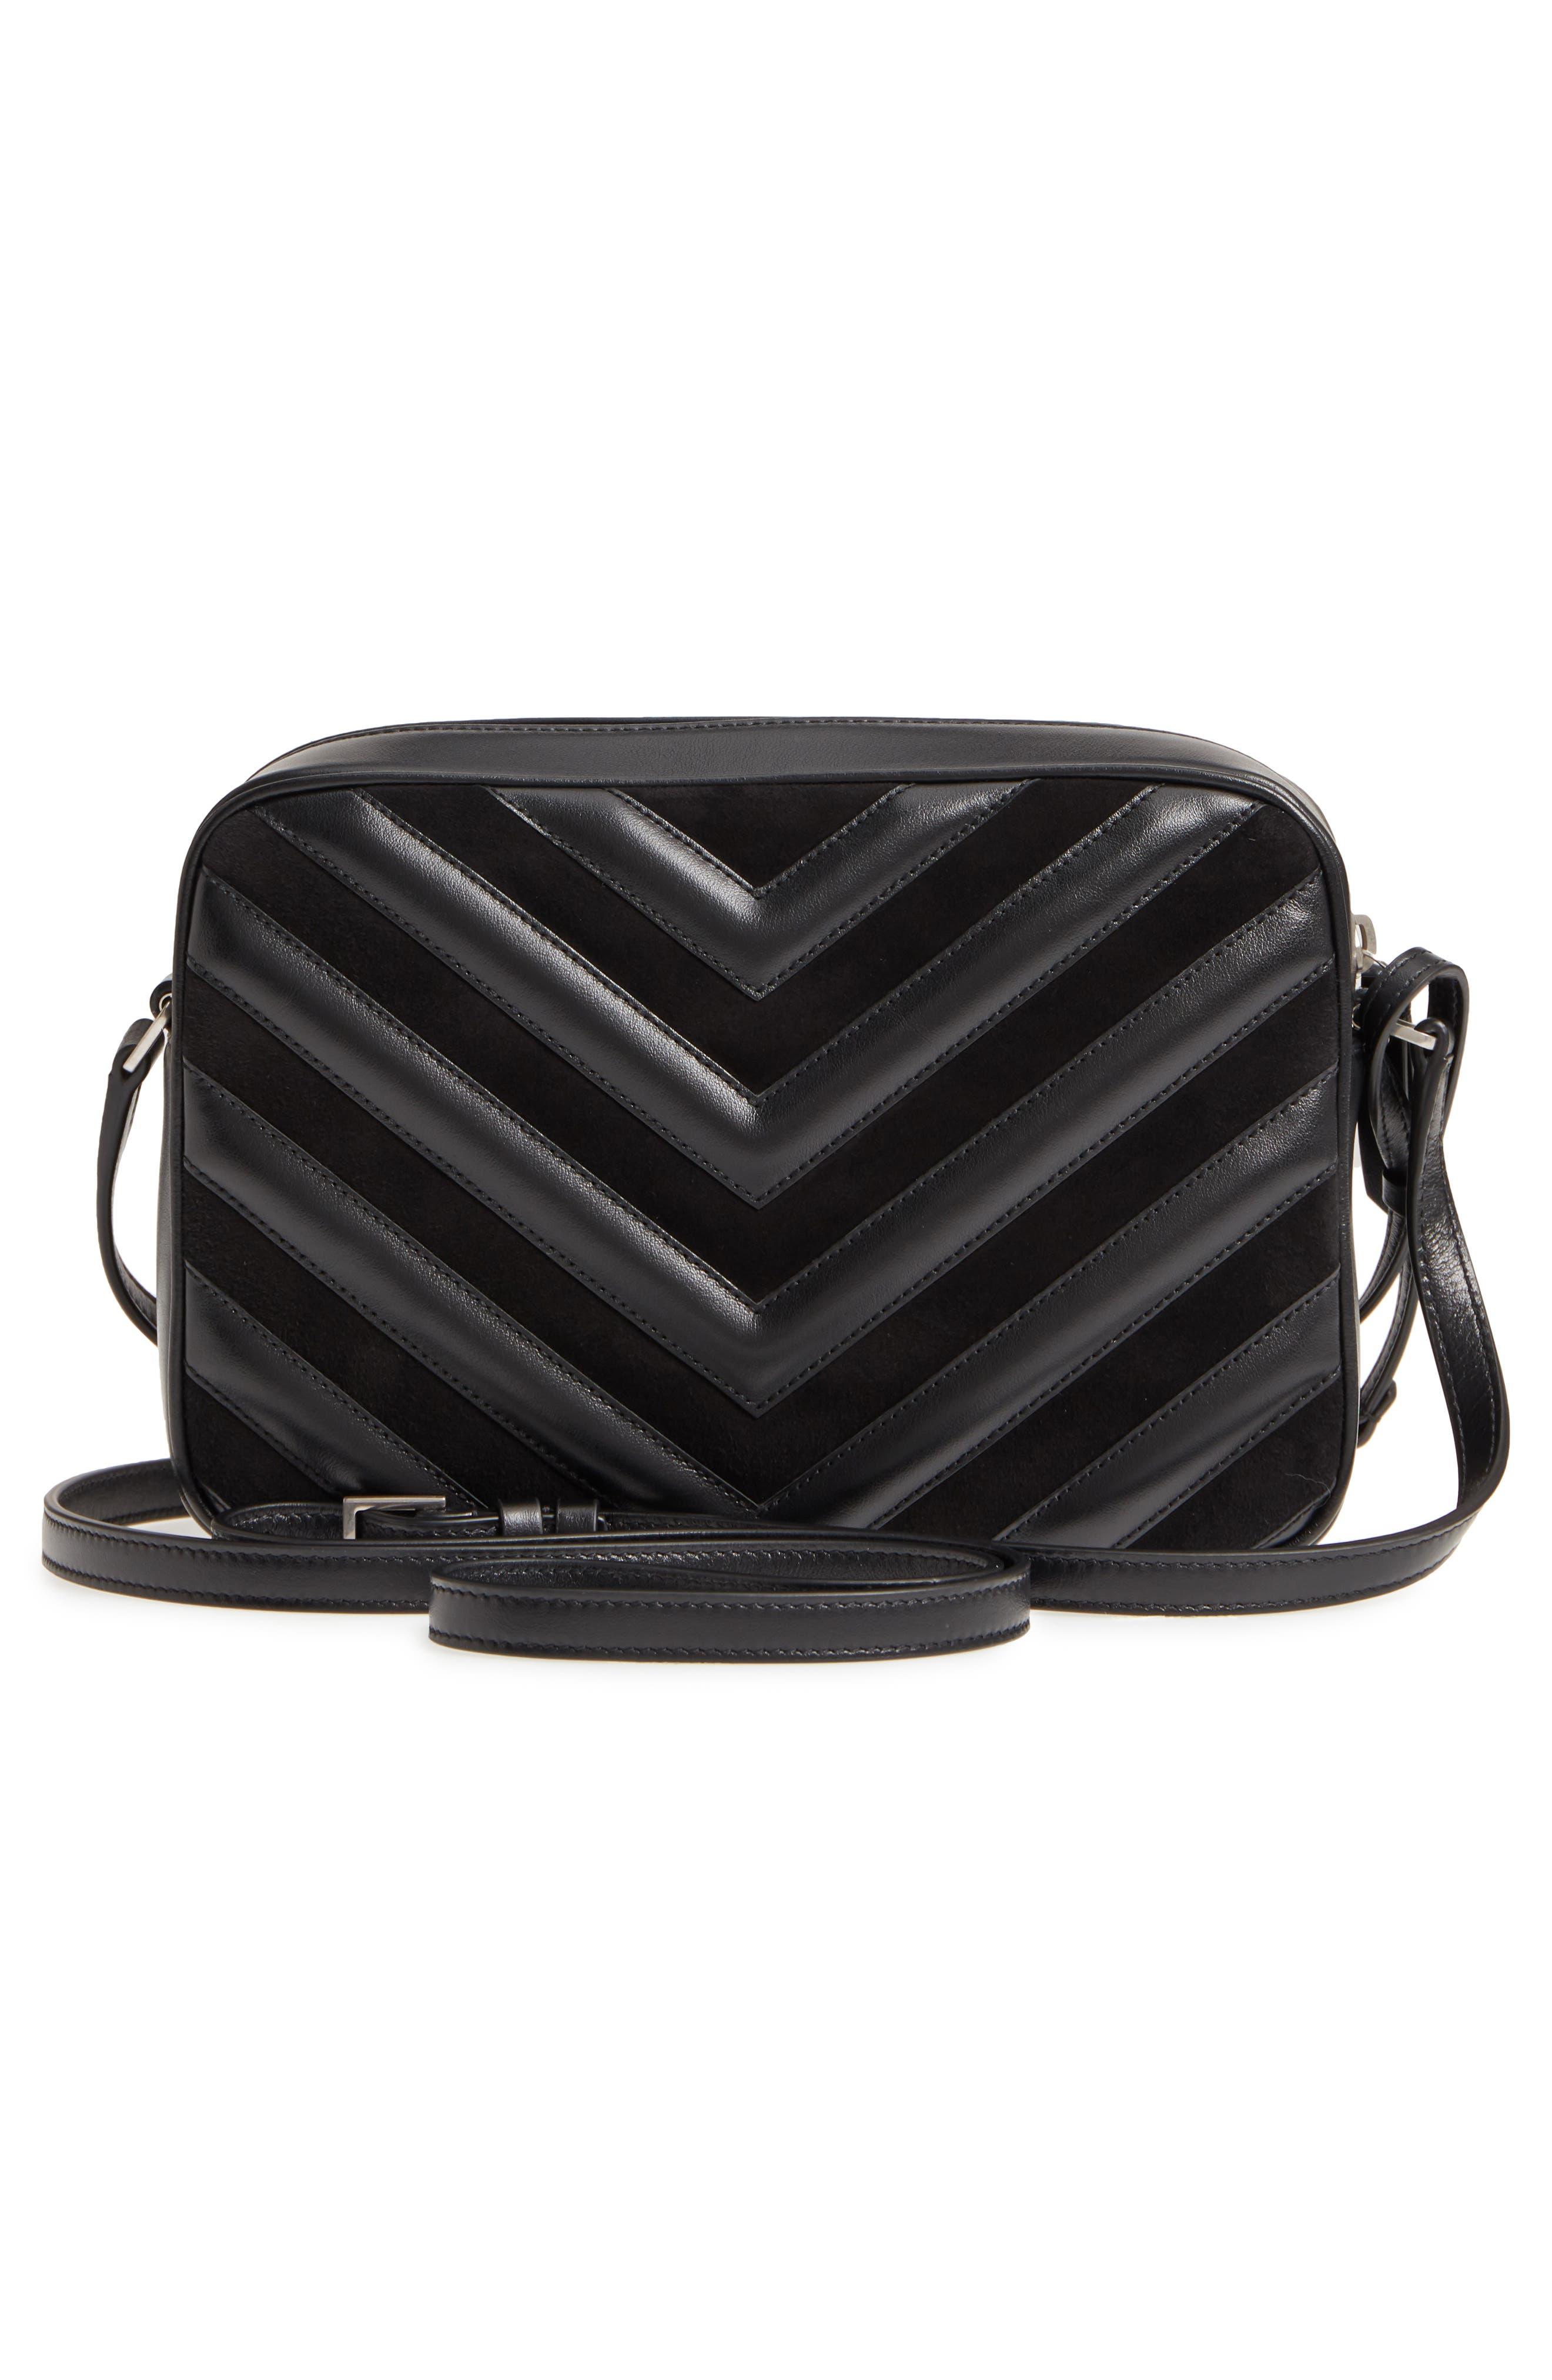 Medium Lou Leather & Suede Camera Bag,                             Alternate thumbnail 3, color,                             Noir